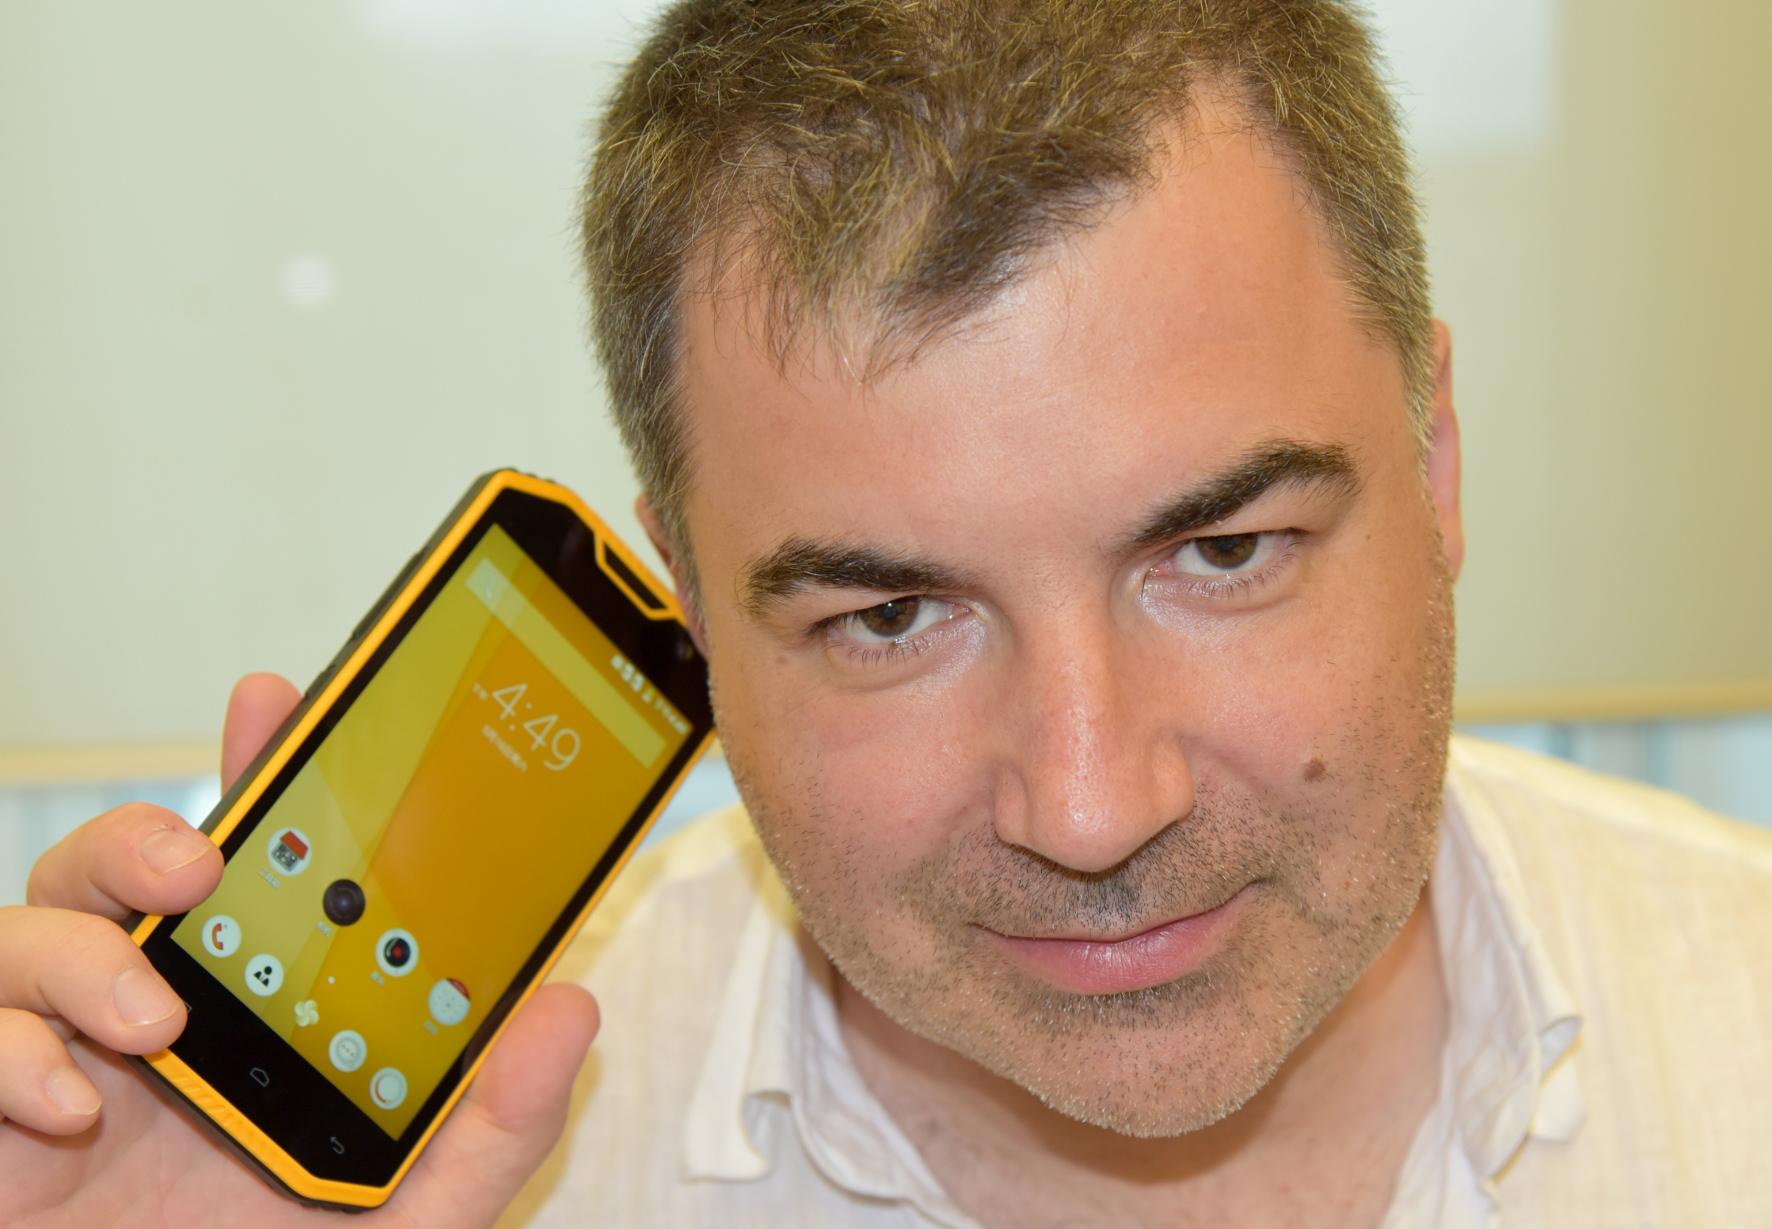 Vereseń 2016: Laureat Nobelivśkoї premiї z fizyky 2010 roku Kostjantyn Novośolov demonstruje komercijnyj smartfon, sensornyj ekran (touchscreen) u jakomu vygotovlenyj z grafenu